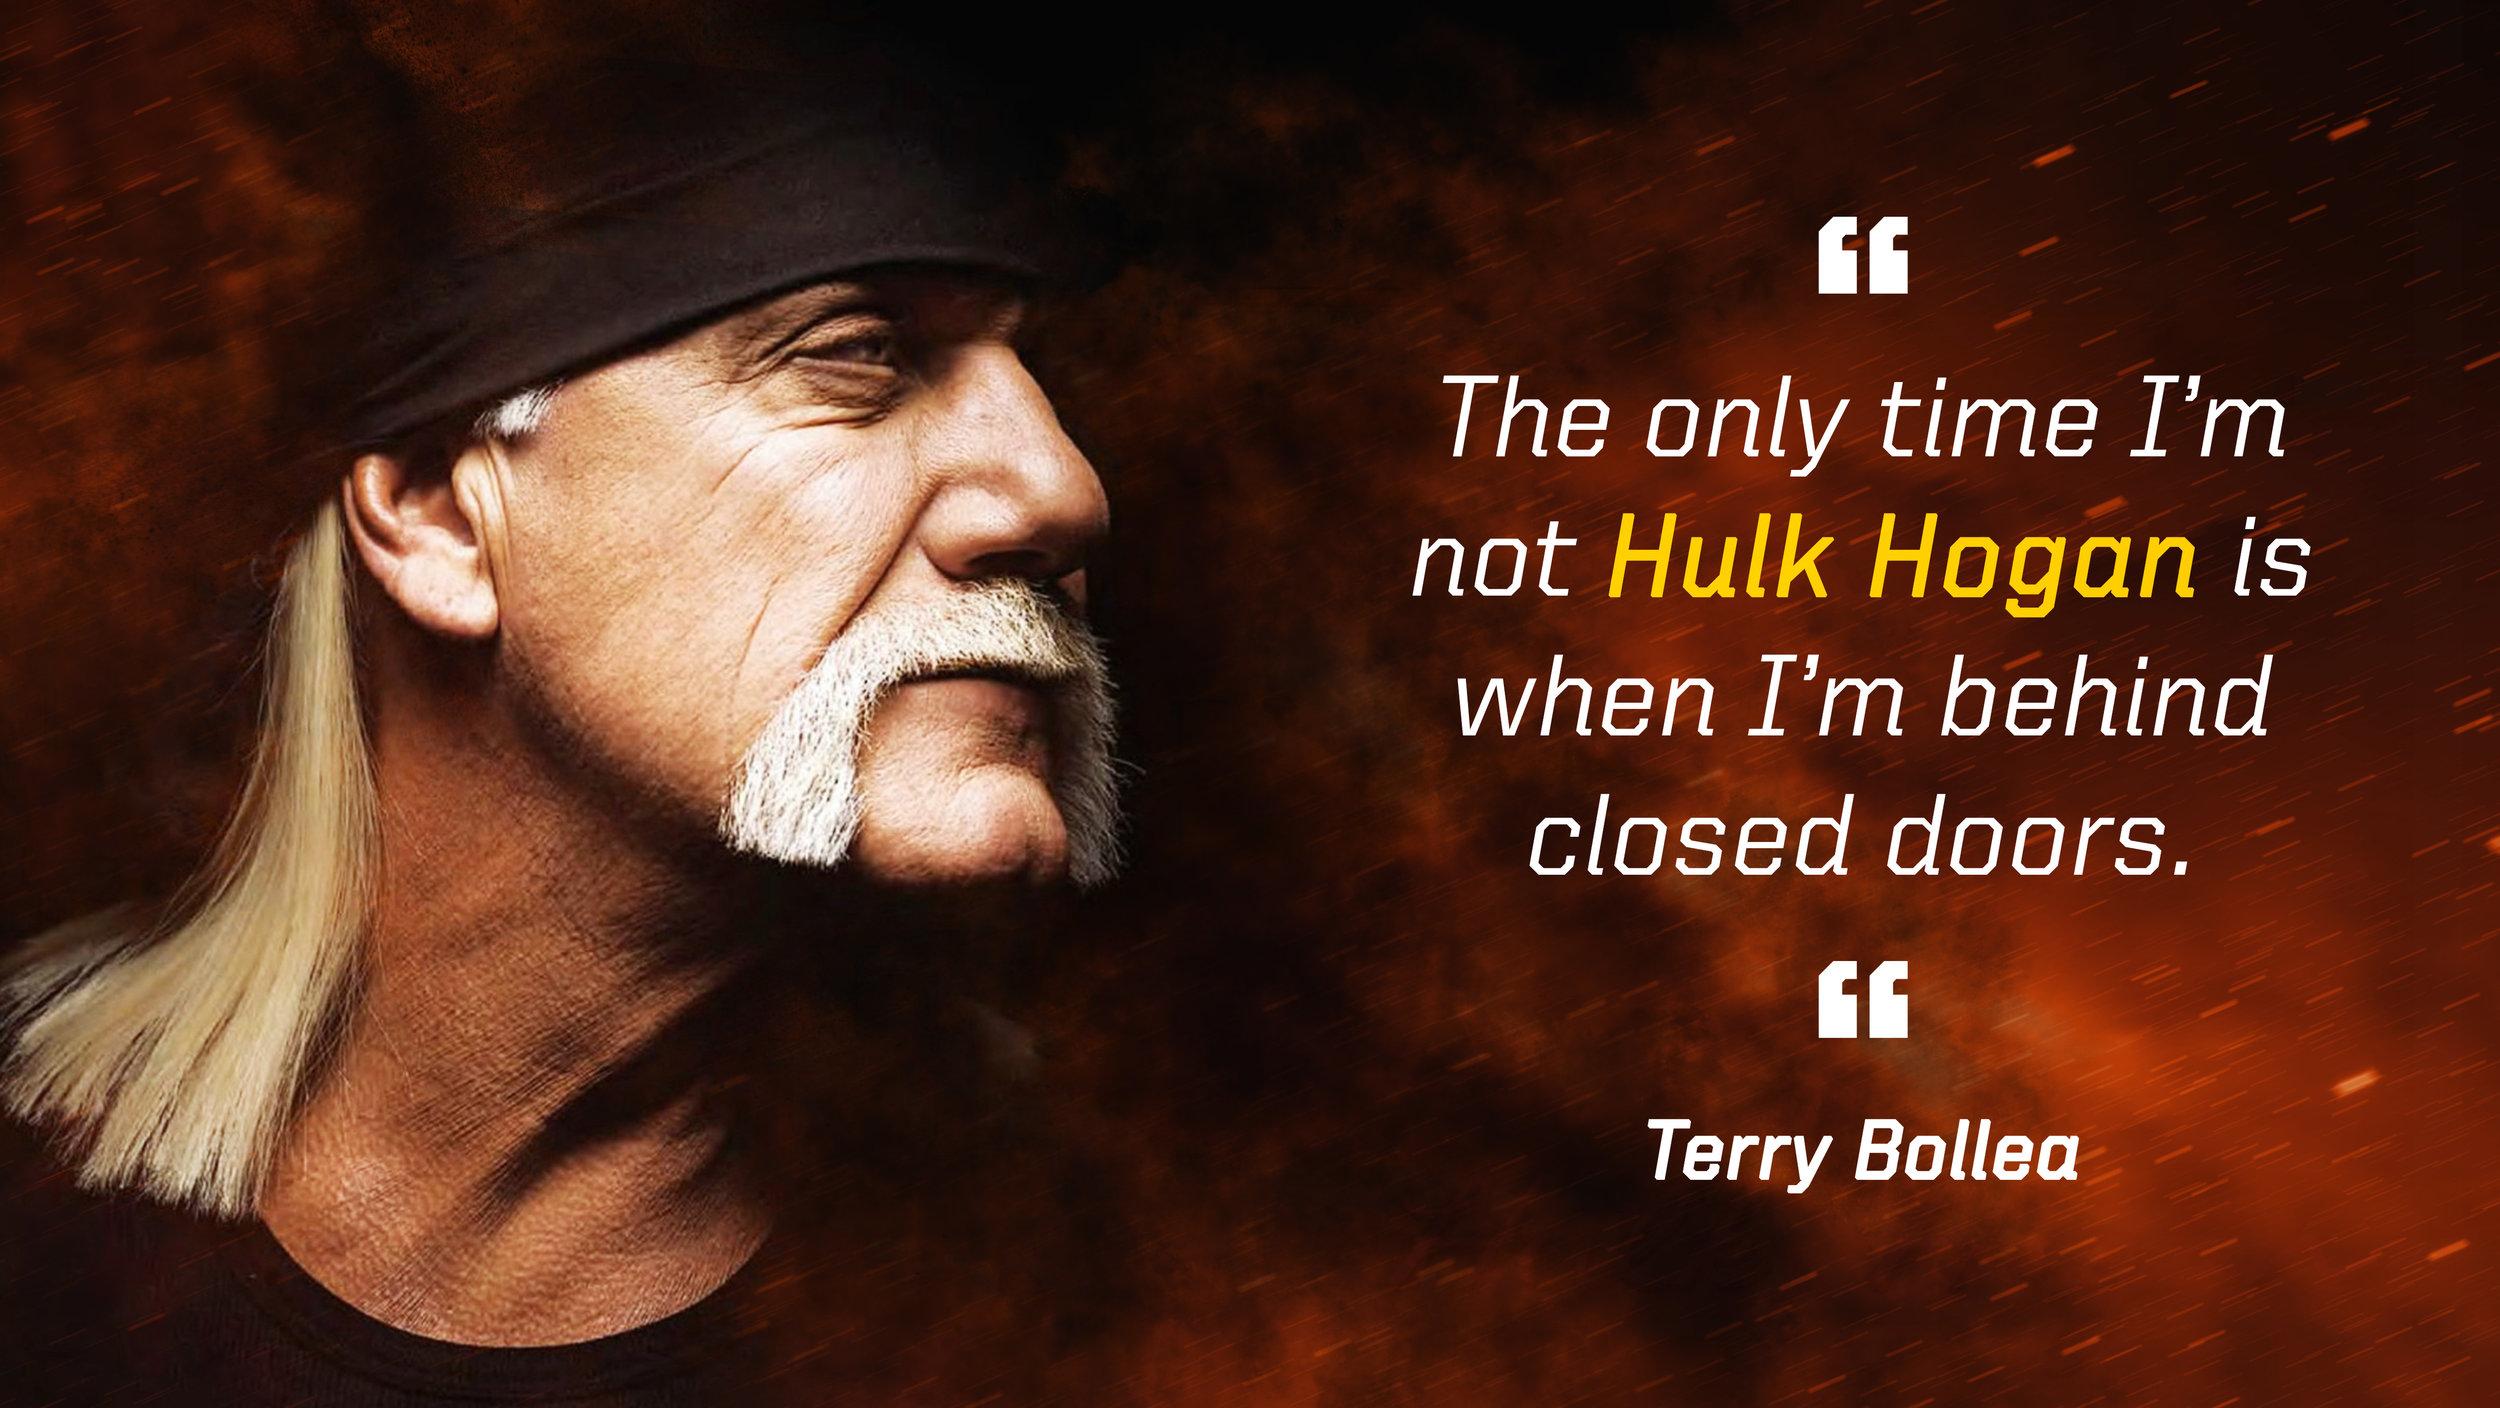 Hulk-Hogan-deck_Page_02_Image_0001.jpg